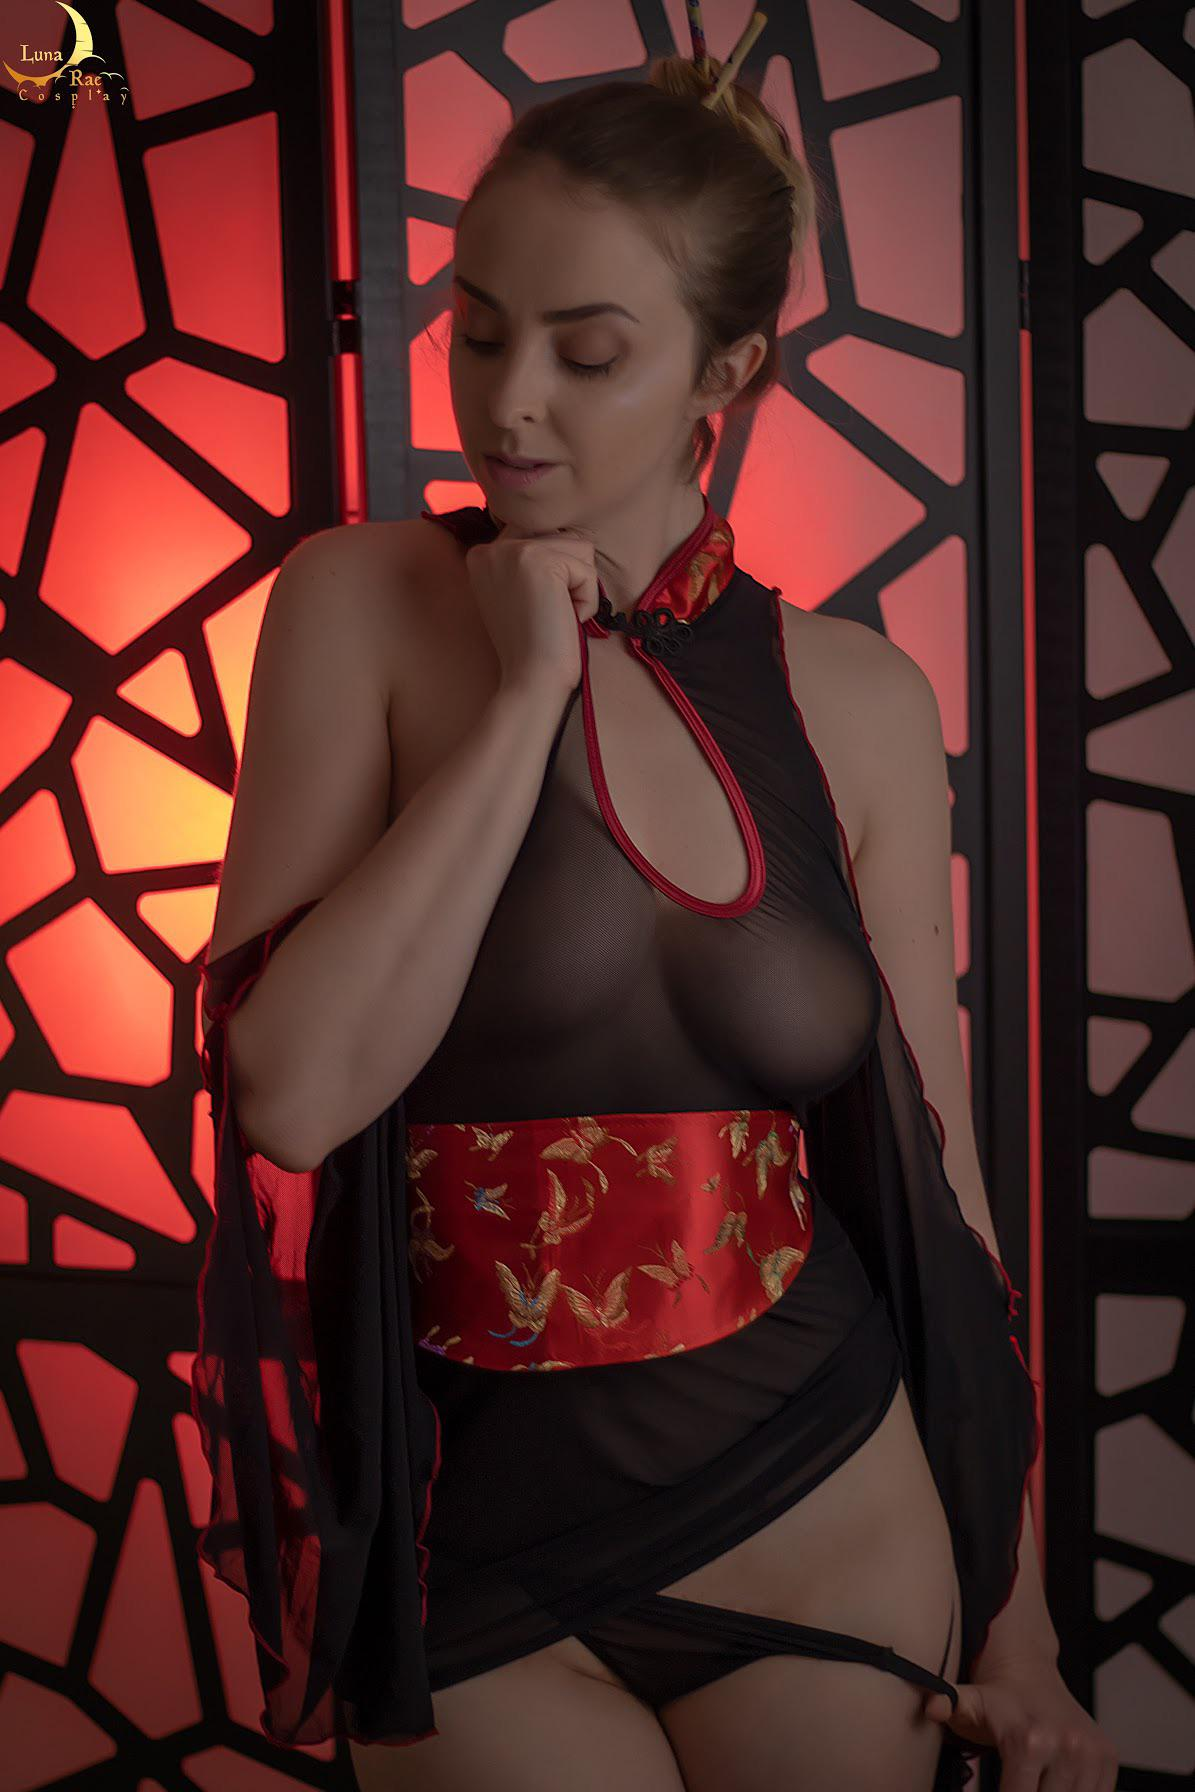 Sexy Mulan See Through By Lunaraecosplay